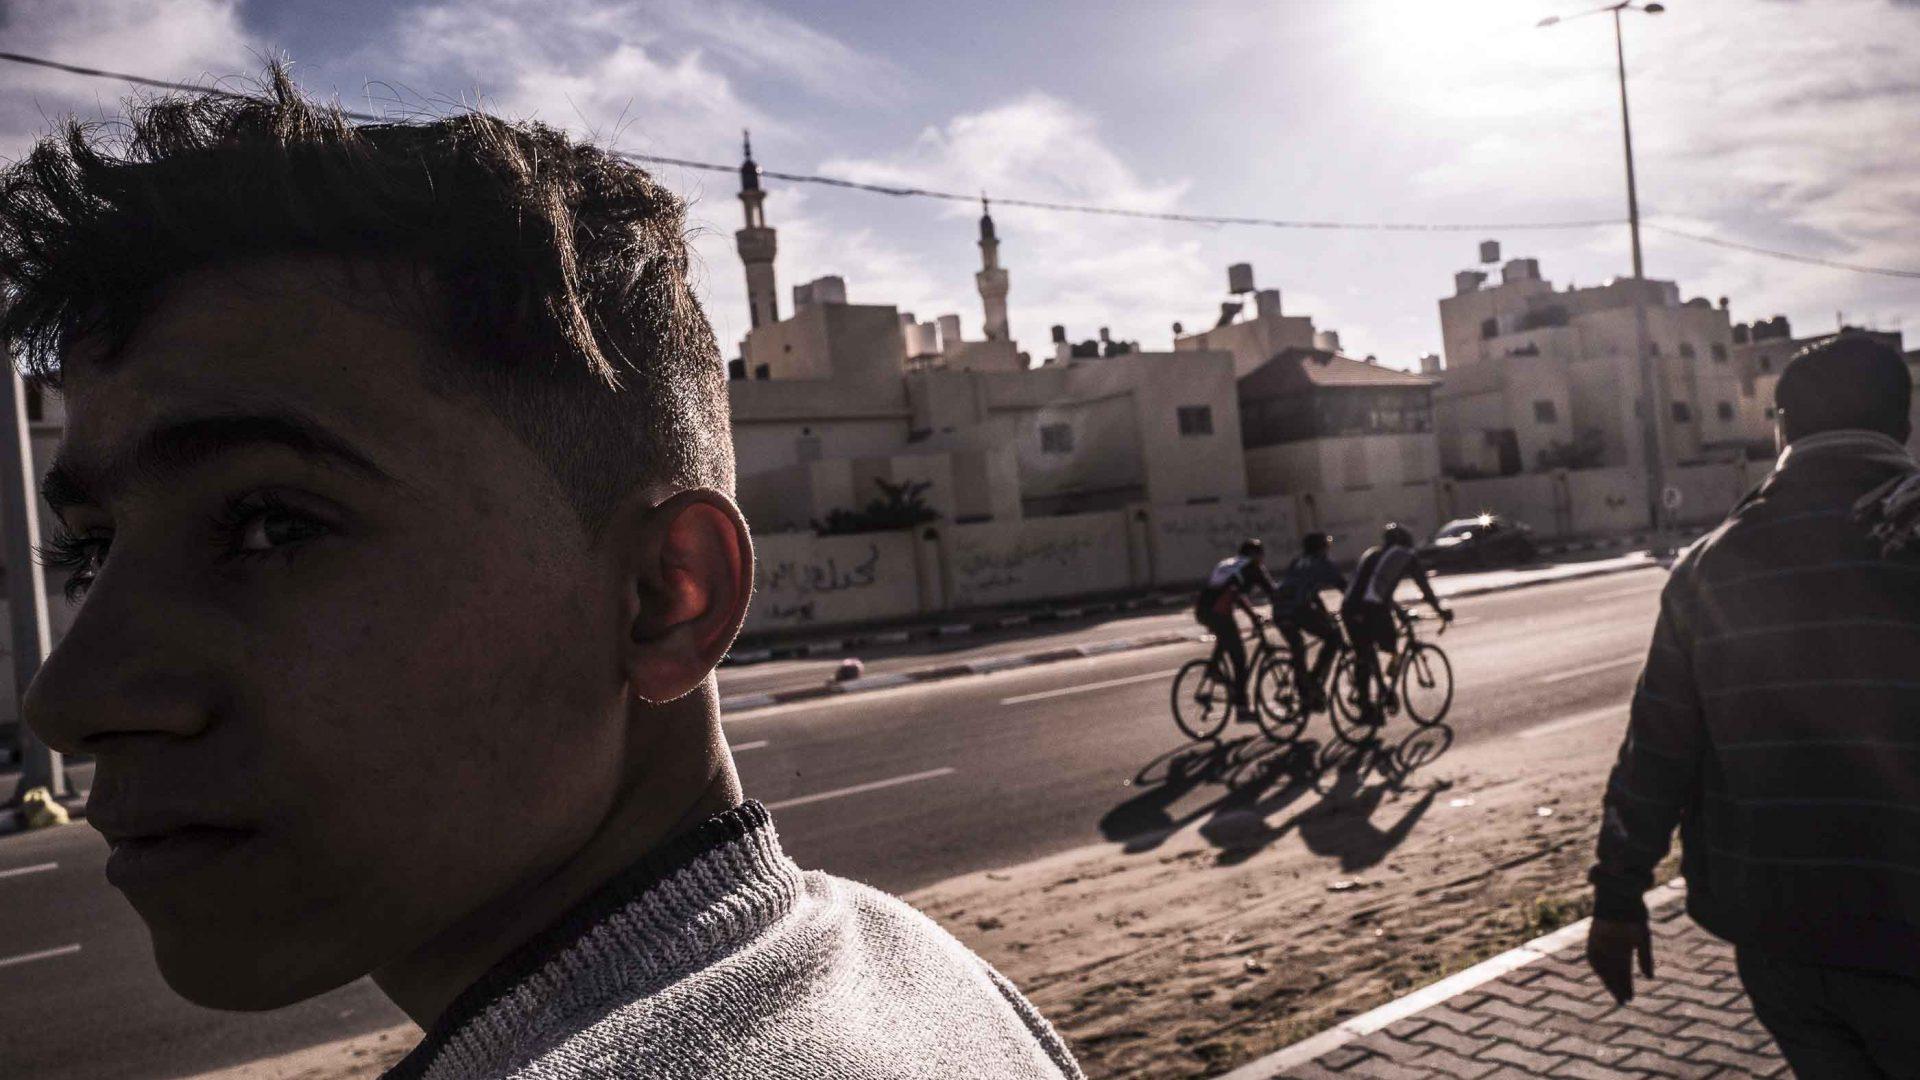 Cyclists in Gaza.